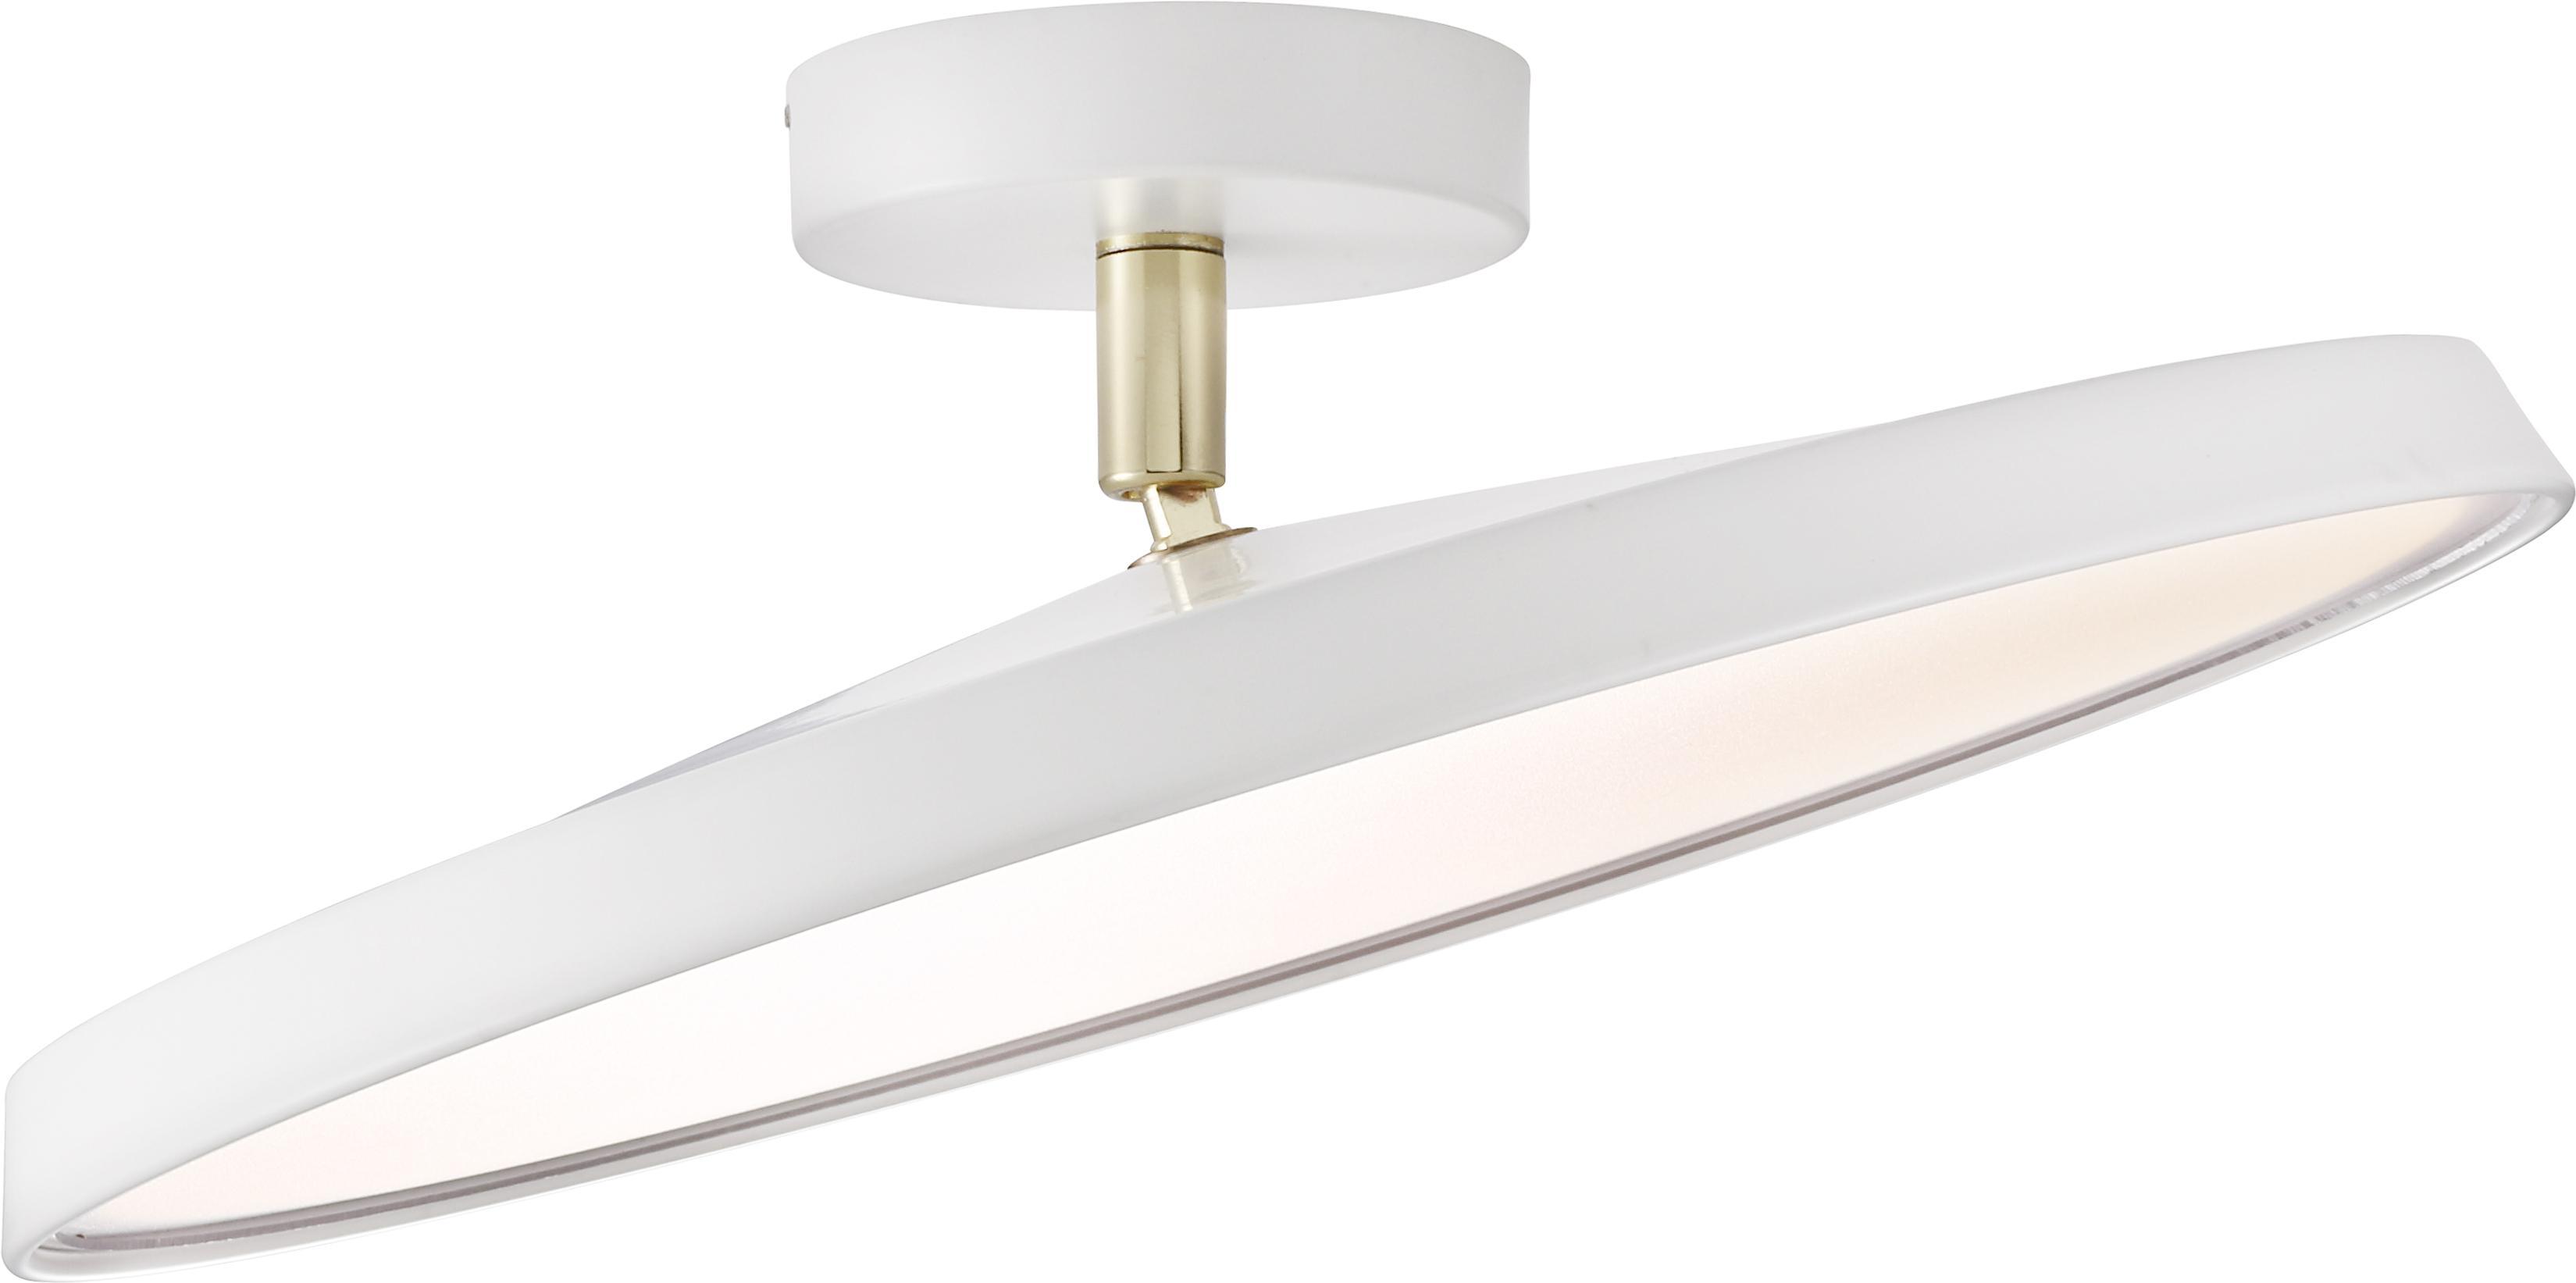 LED plafondlamp Alba in wit, Lampenkap: aluminium, Diffuser: acrylglas, Wit, Ø 40 x H 12 cm